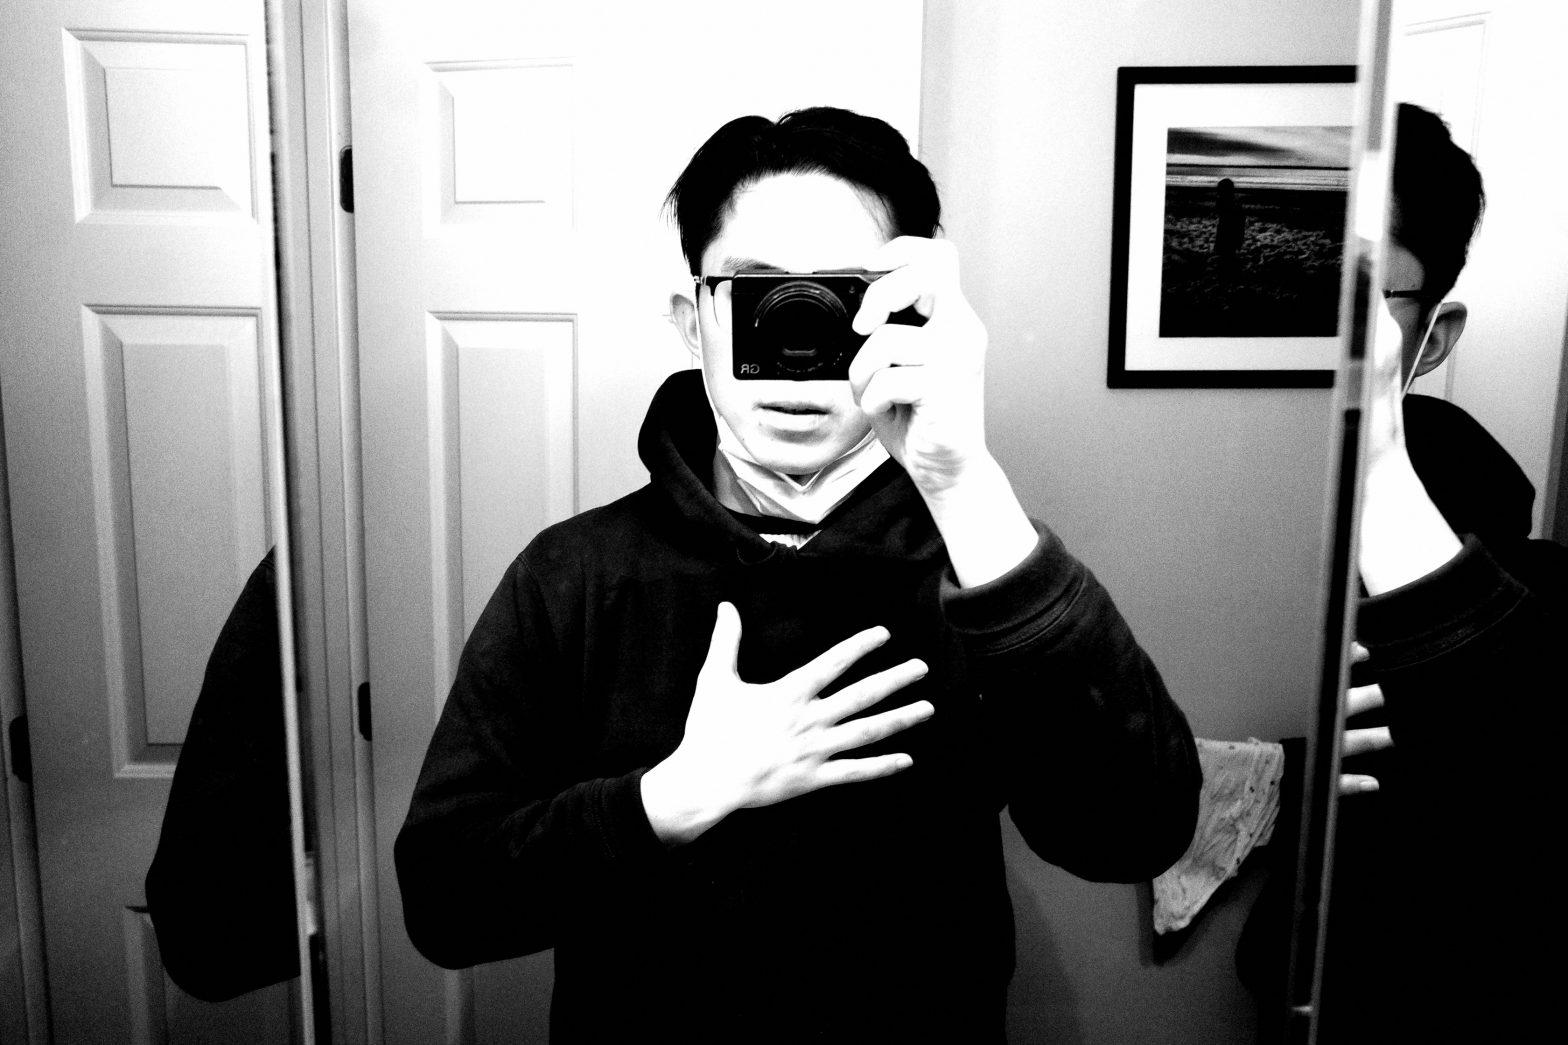 selfie ERIC KIM Ricoh gr iii